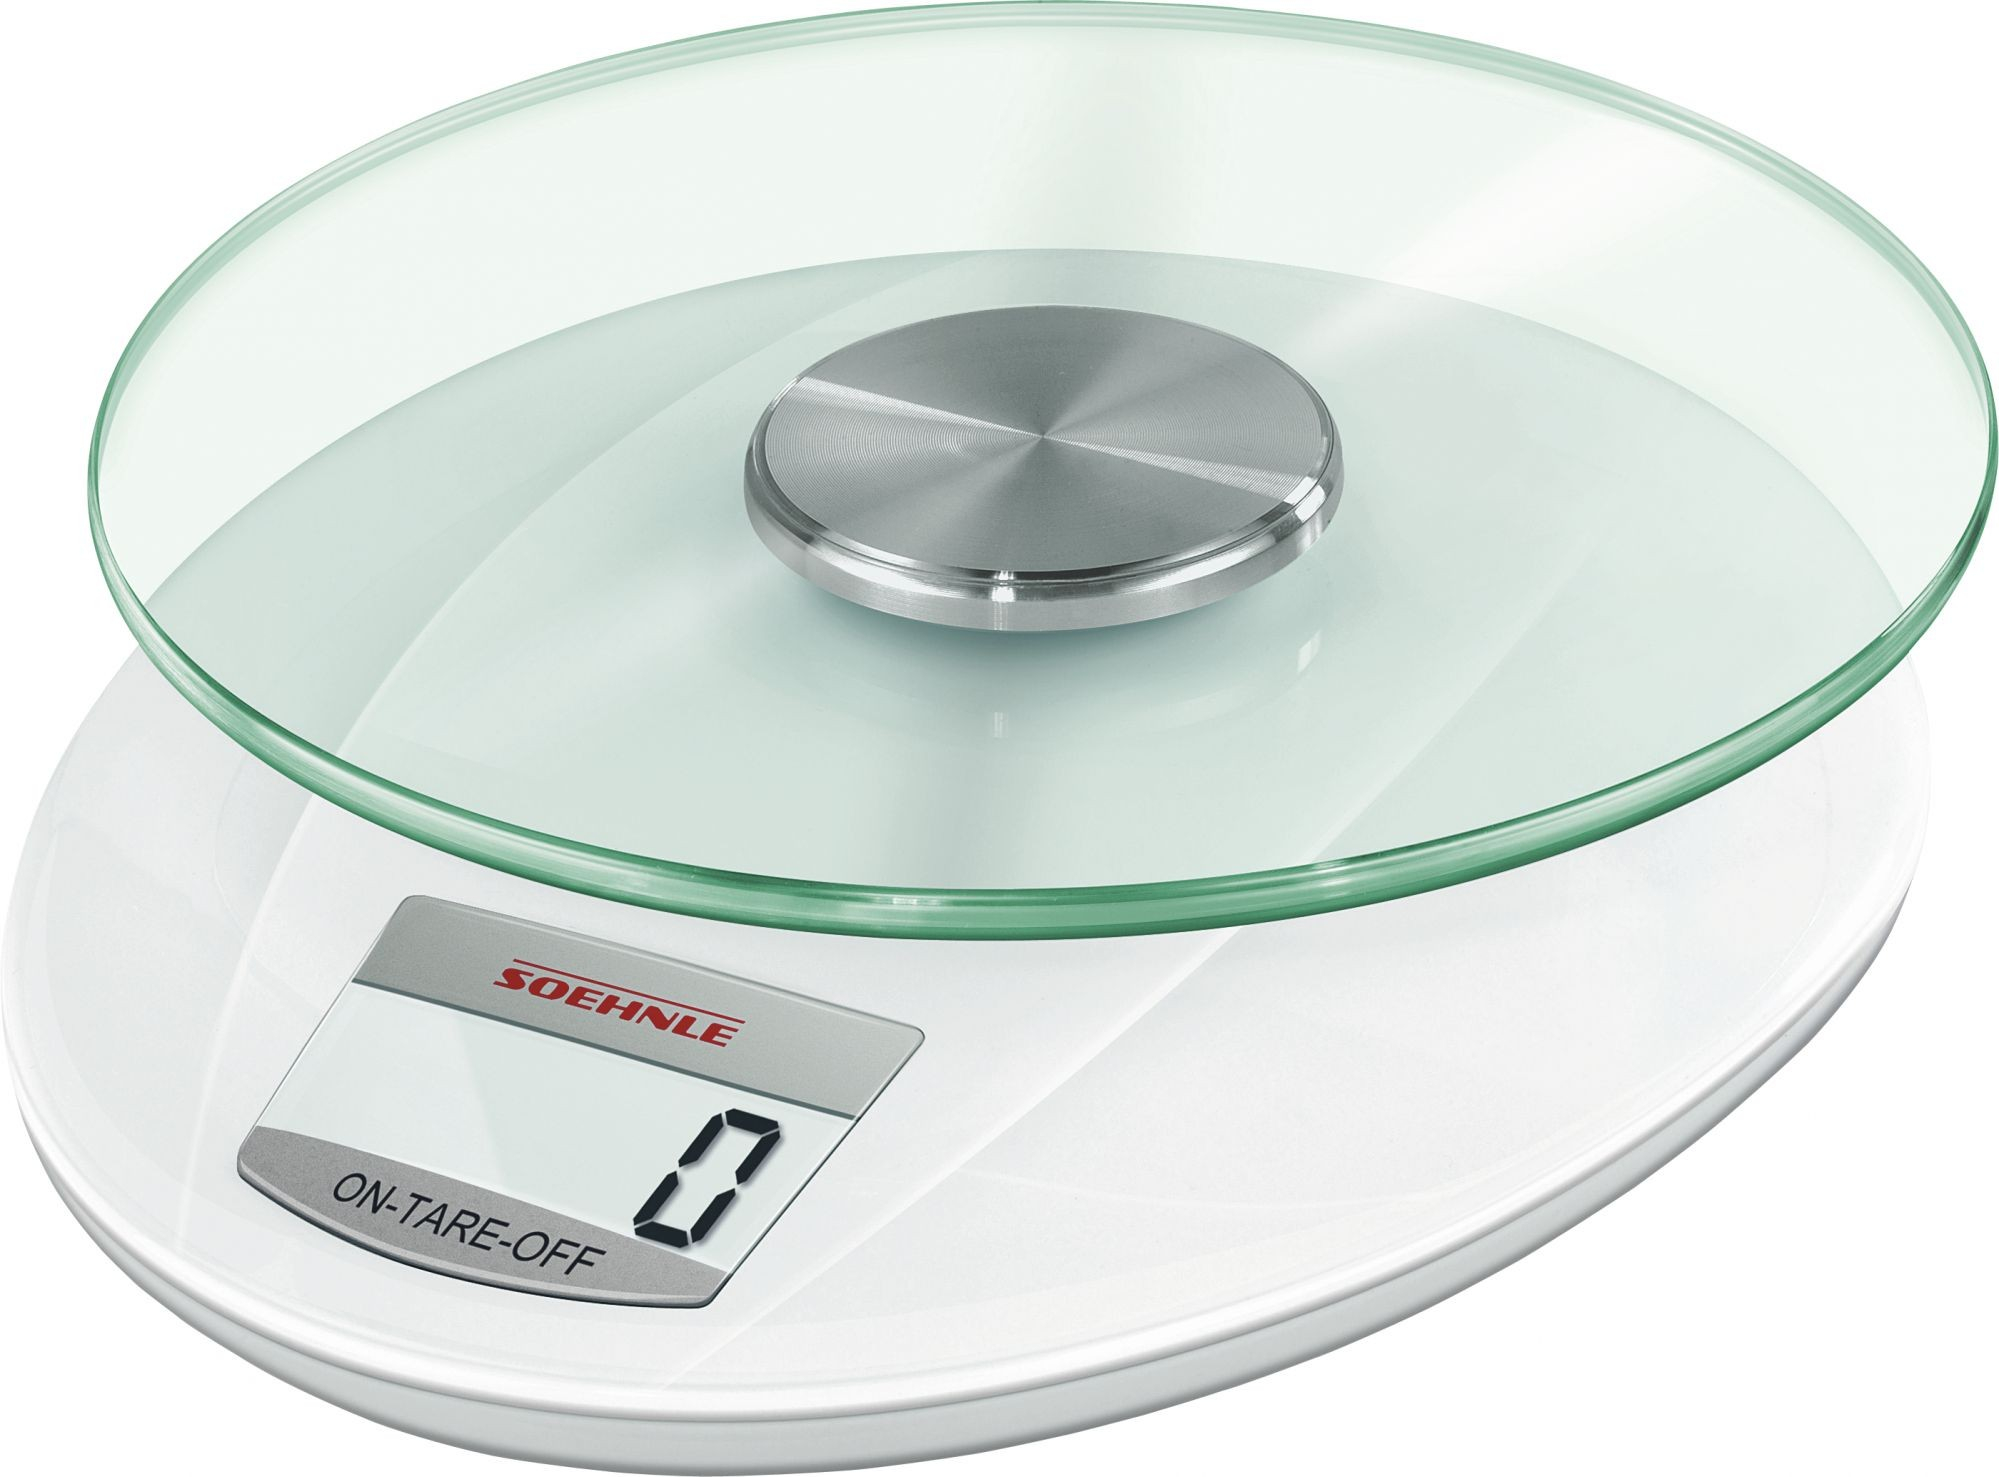 Soehnle ROMA kuchyňská váha 65847